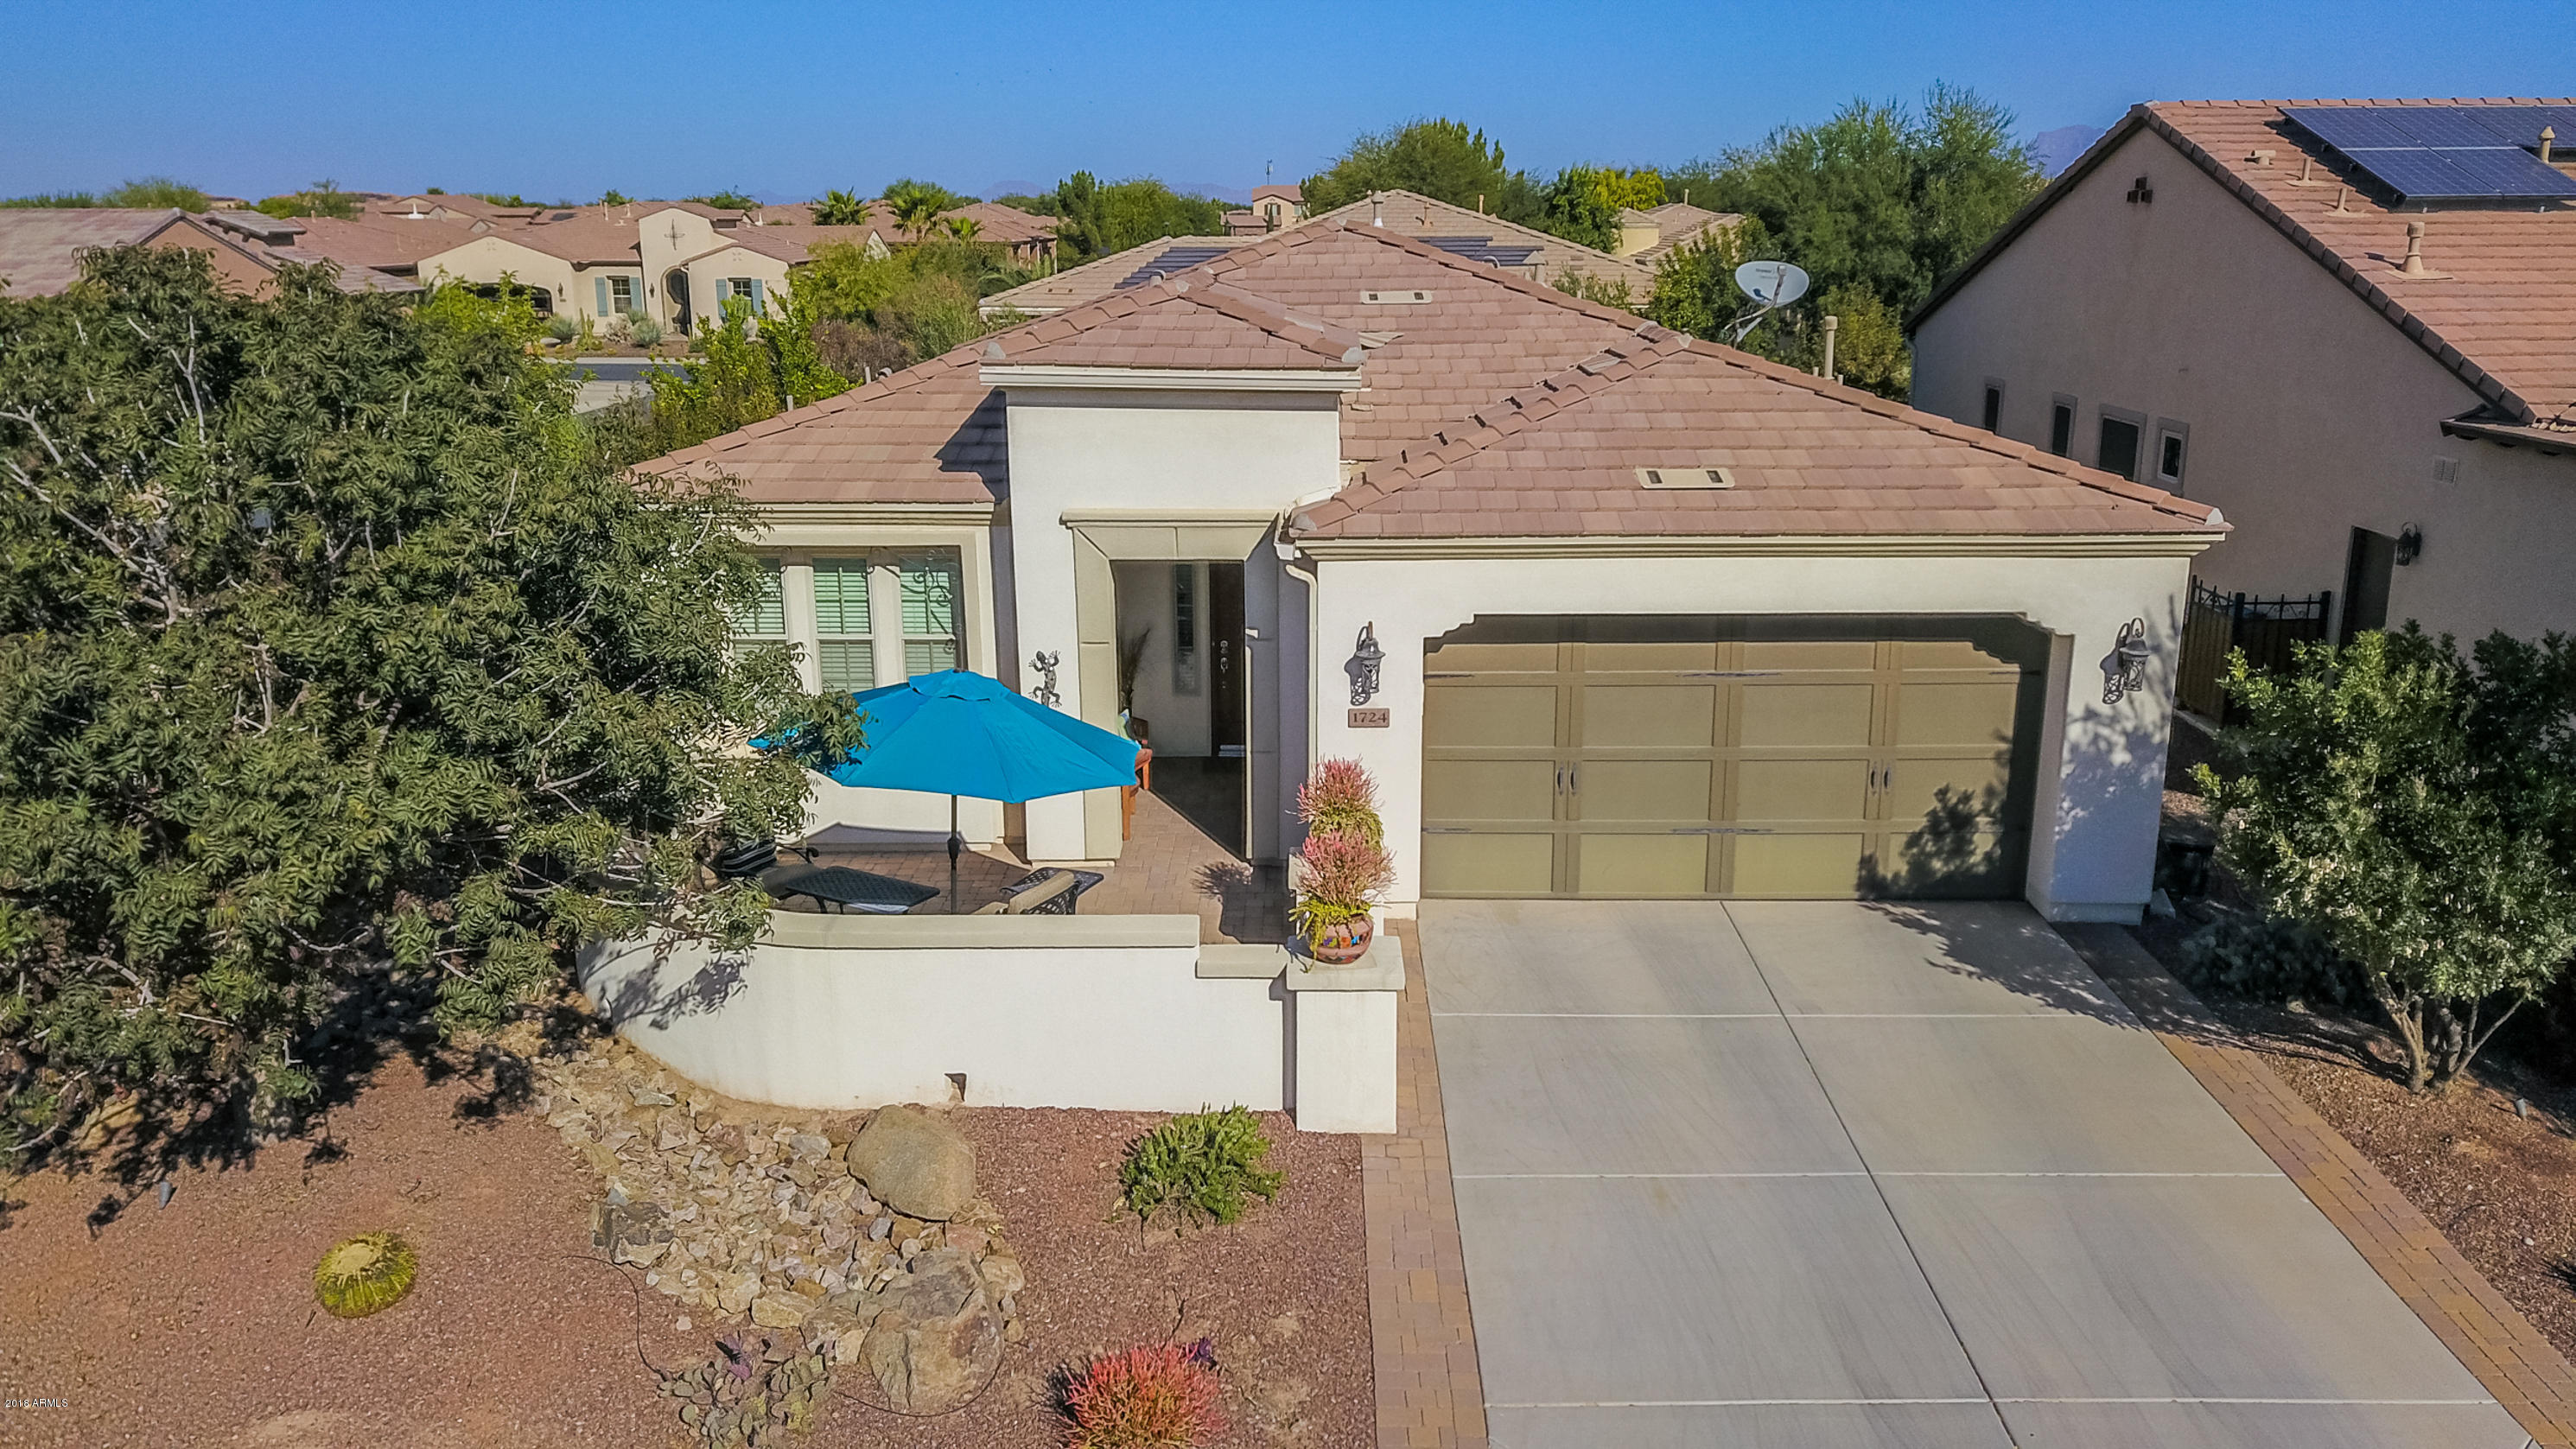 Photo of 1724 E SATTOO Way, San Tan Valley, AZ 85140